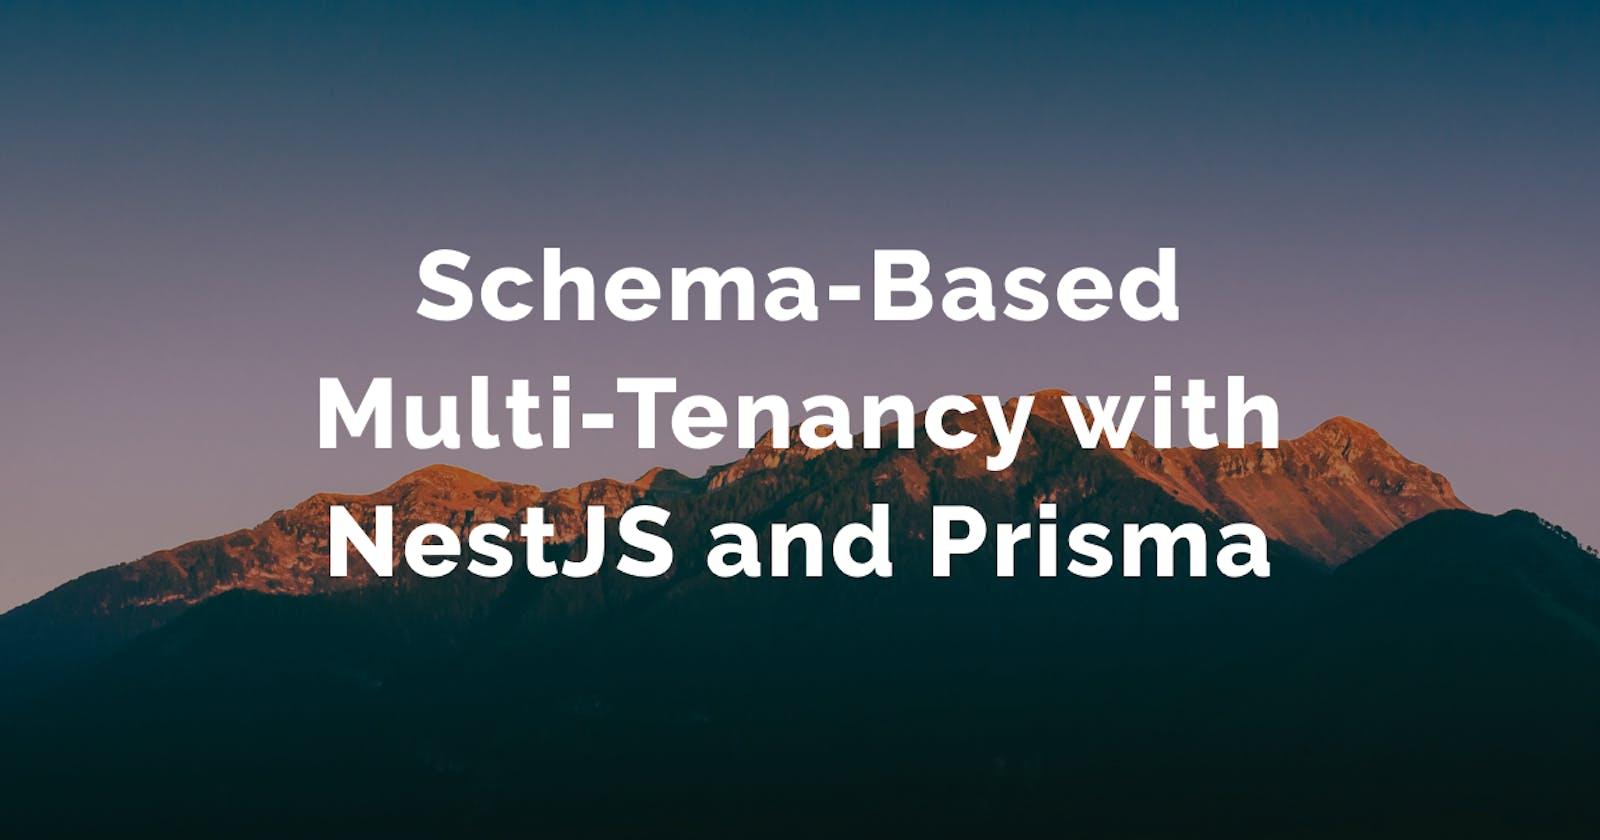 Schema-Based Multi-Tenancy with NestJS and Prisma